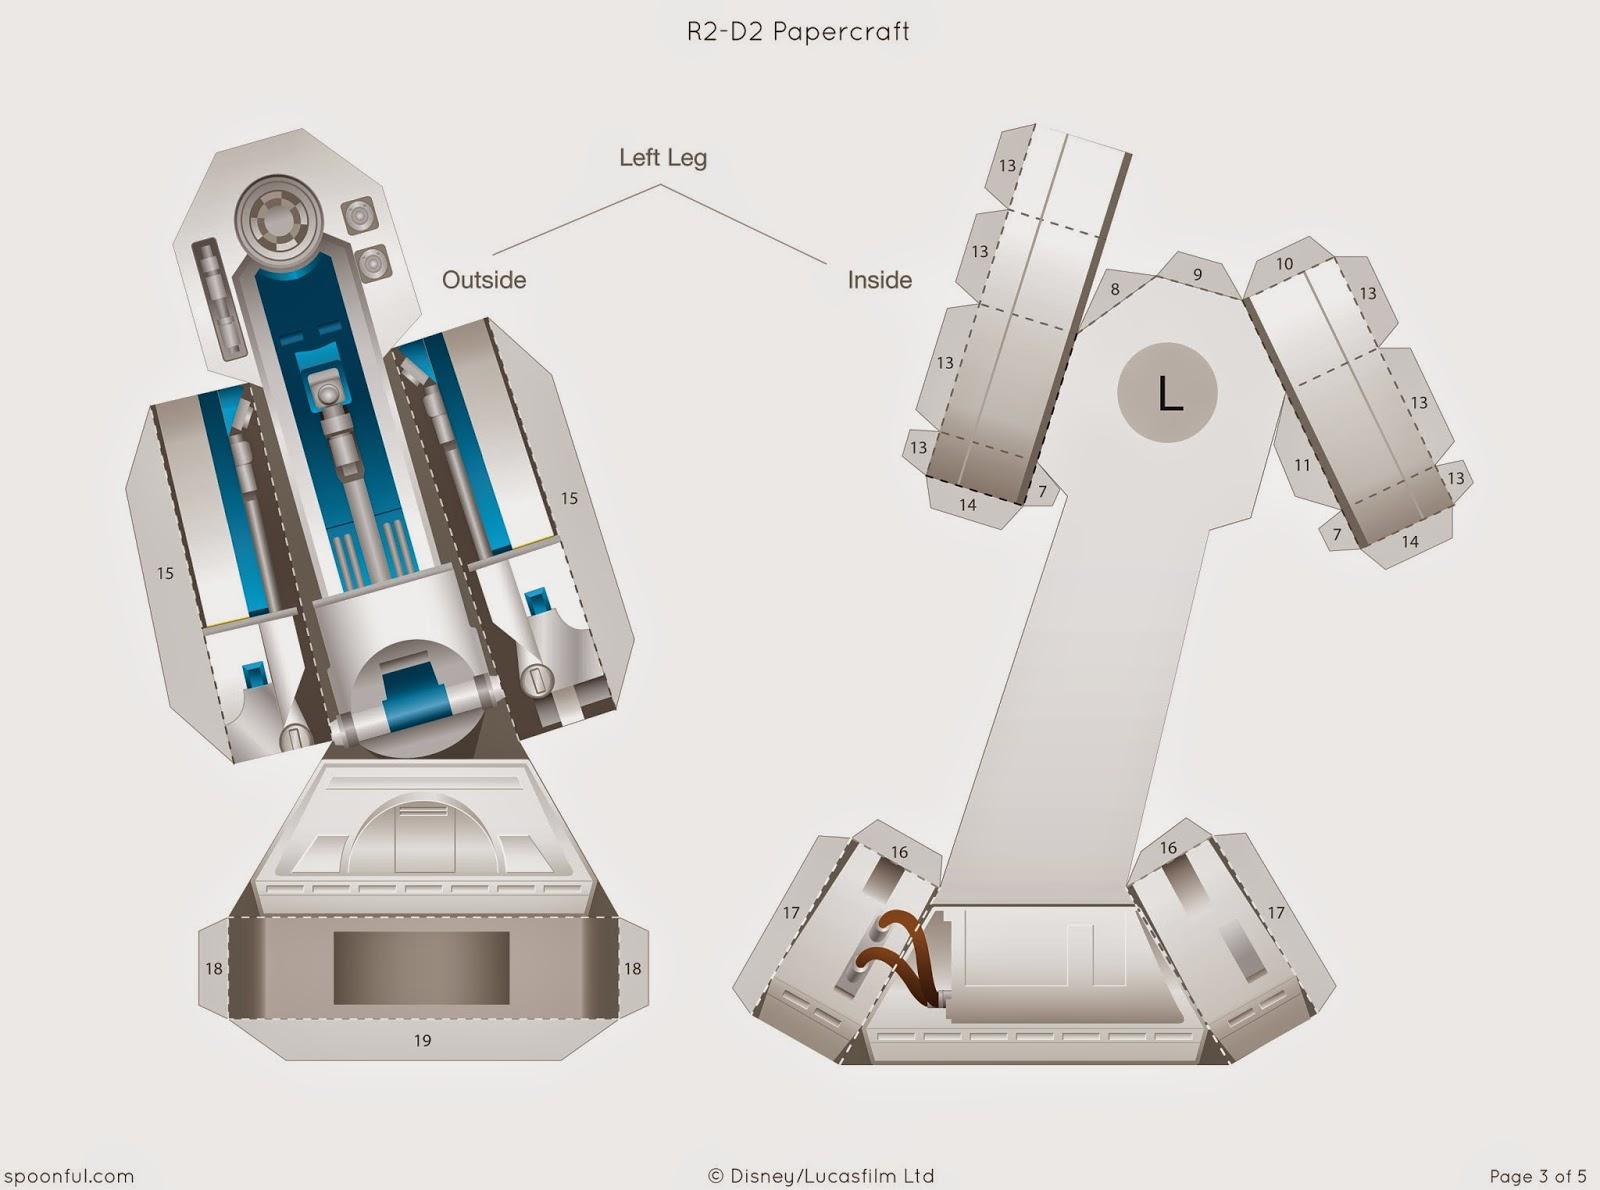 Descargable imprimible de R2-D2 de la saga de Star Wars para maqueta 3d-4